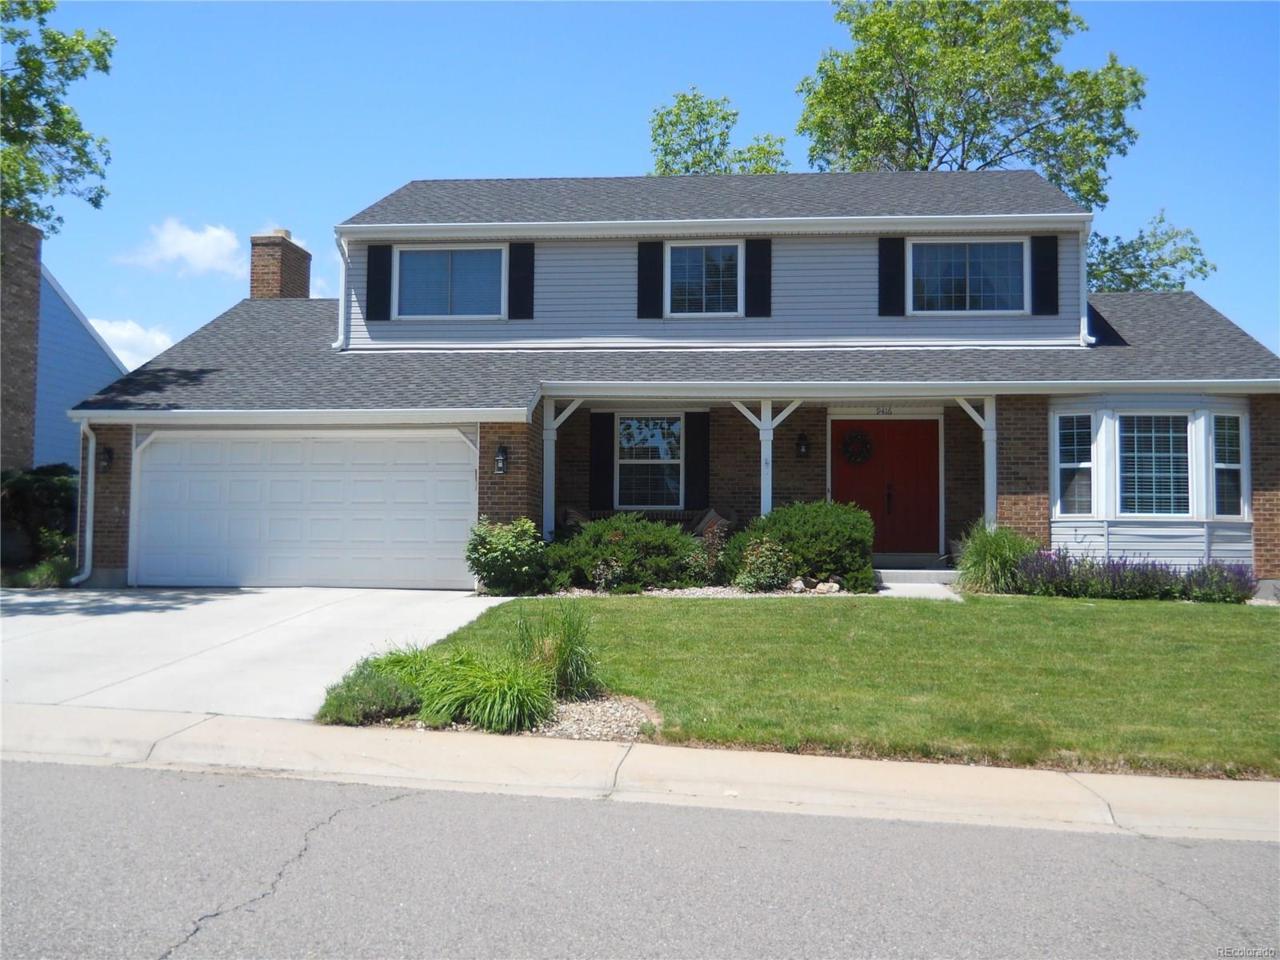 9416 W Geddes Place, Littleton, CO 80128 (MLS #6285703) :: 8z Real Estate